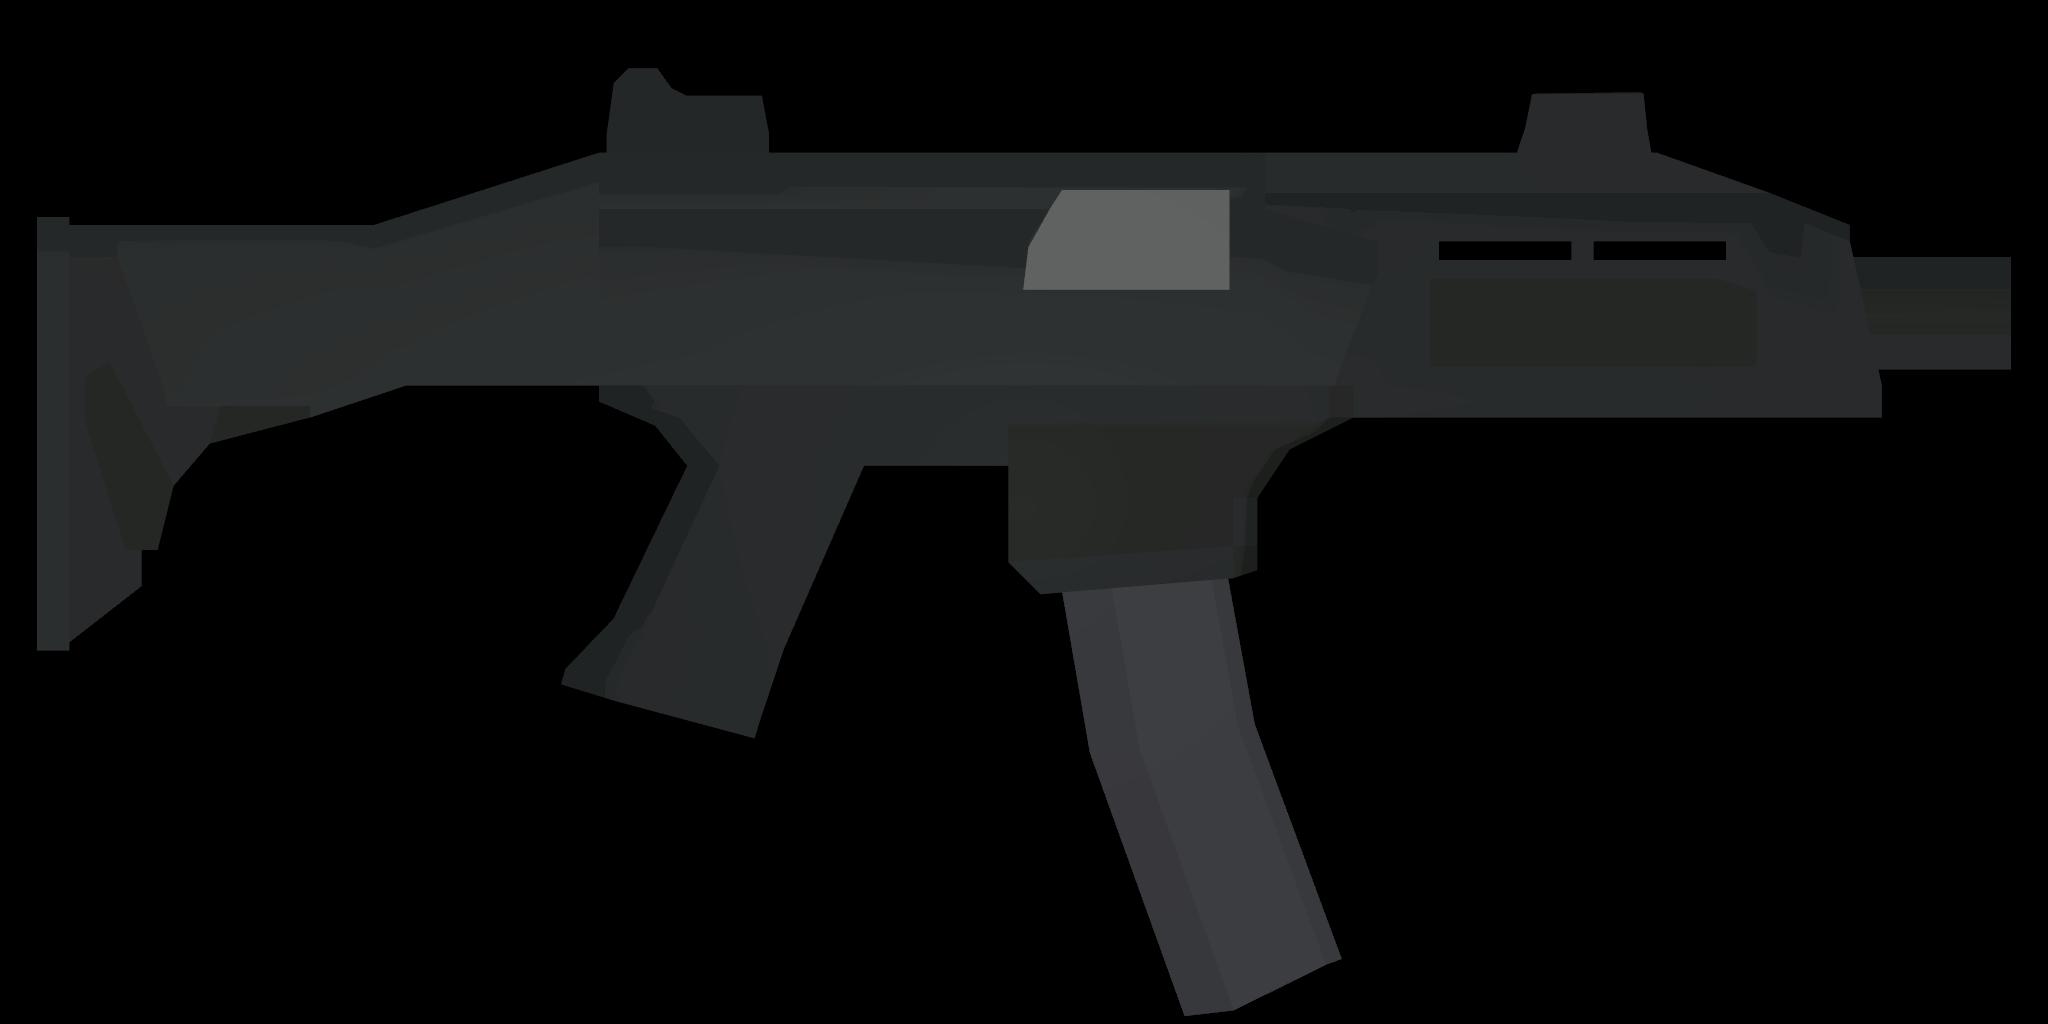 Unturned Uncreated Warfare Mods & All ID List + Attachments - Neutral Weapons - 410B00B